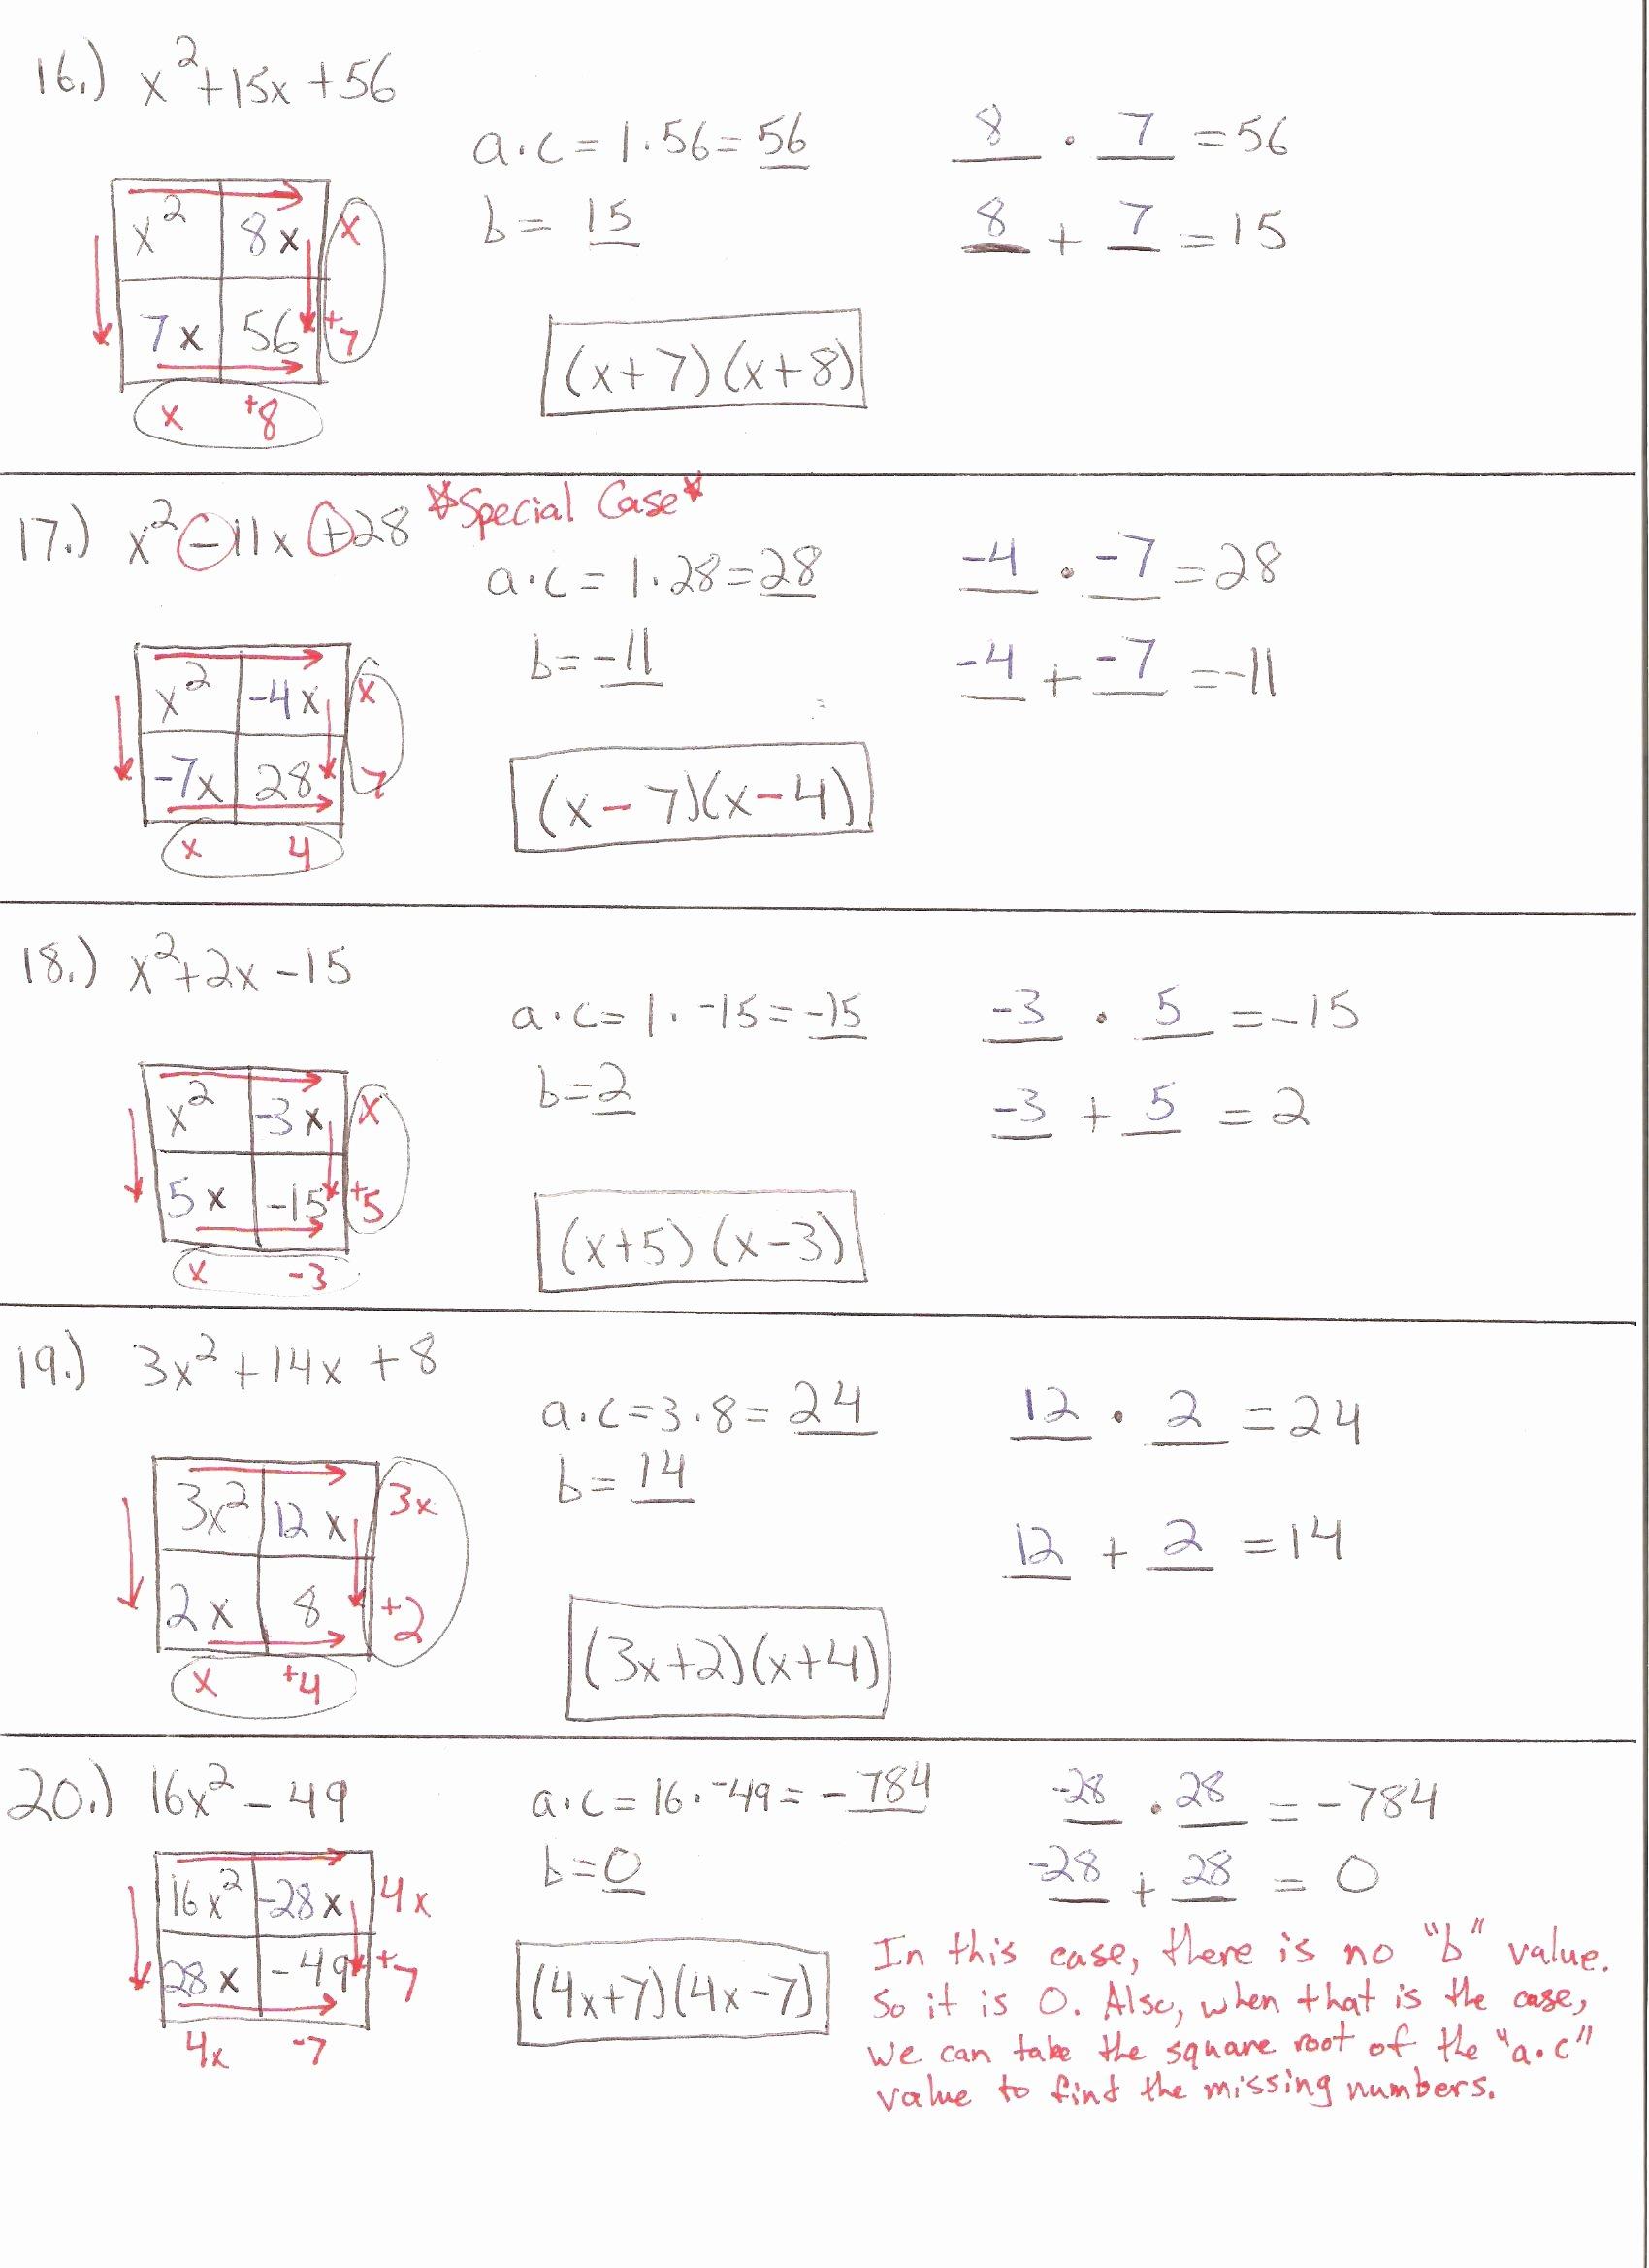 Solving Square Root Equations Worksheet Fresh solving Square Root Equations Worksheet Algebra 2 Answer